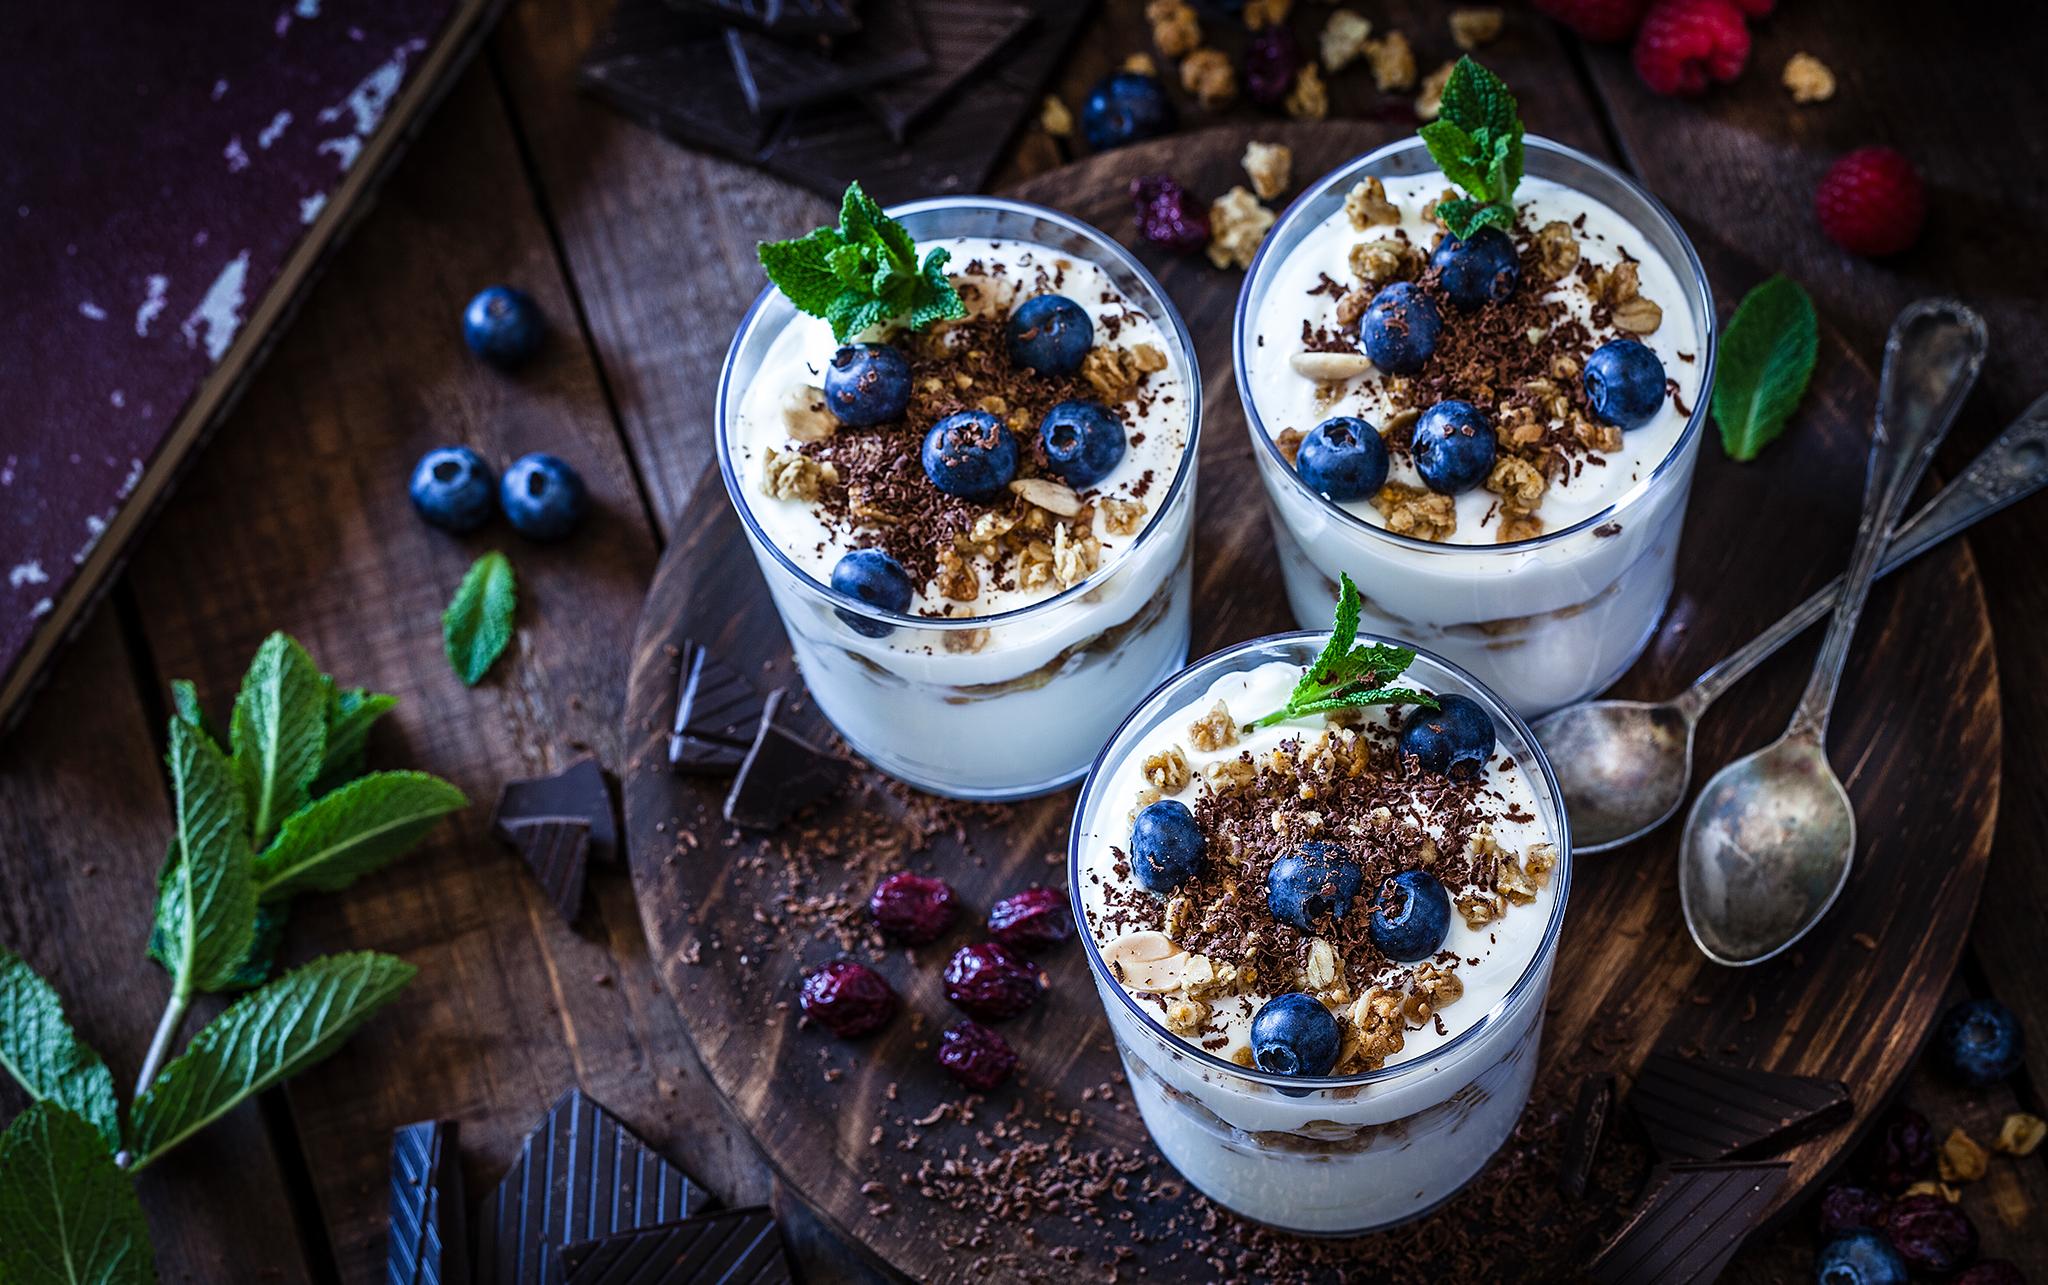 Yogurts and toppings